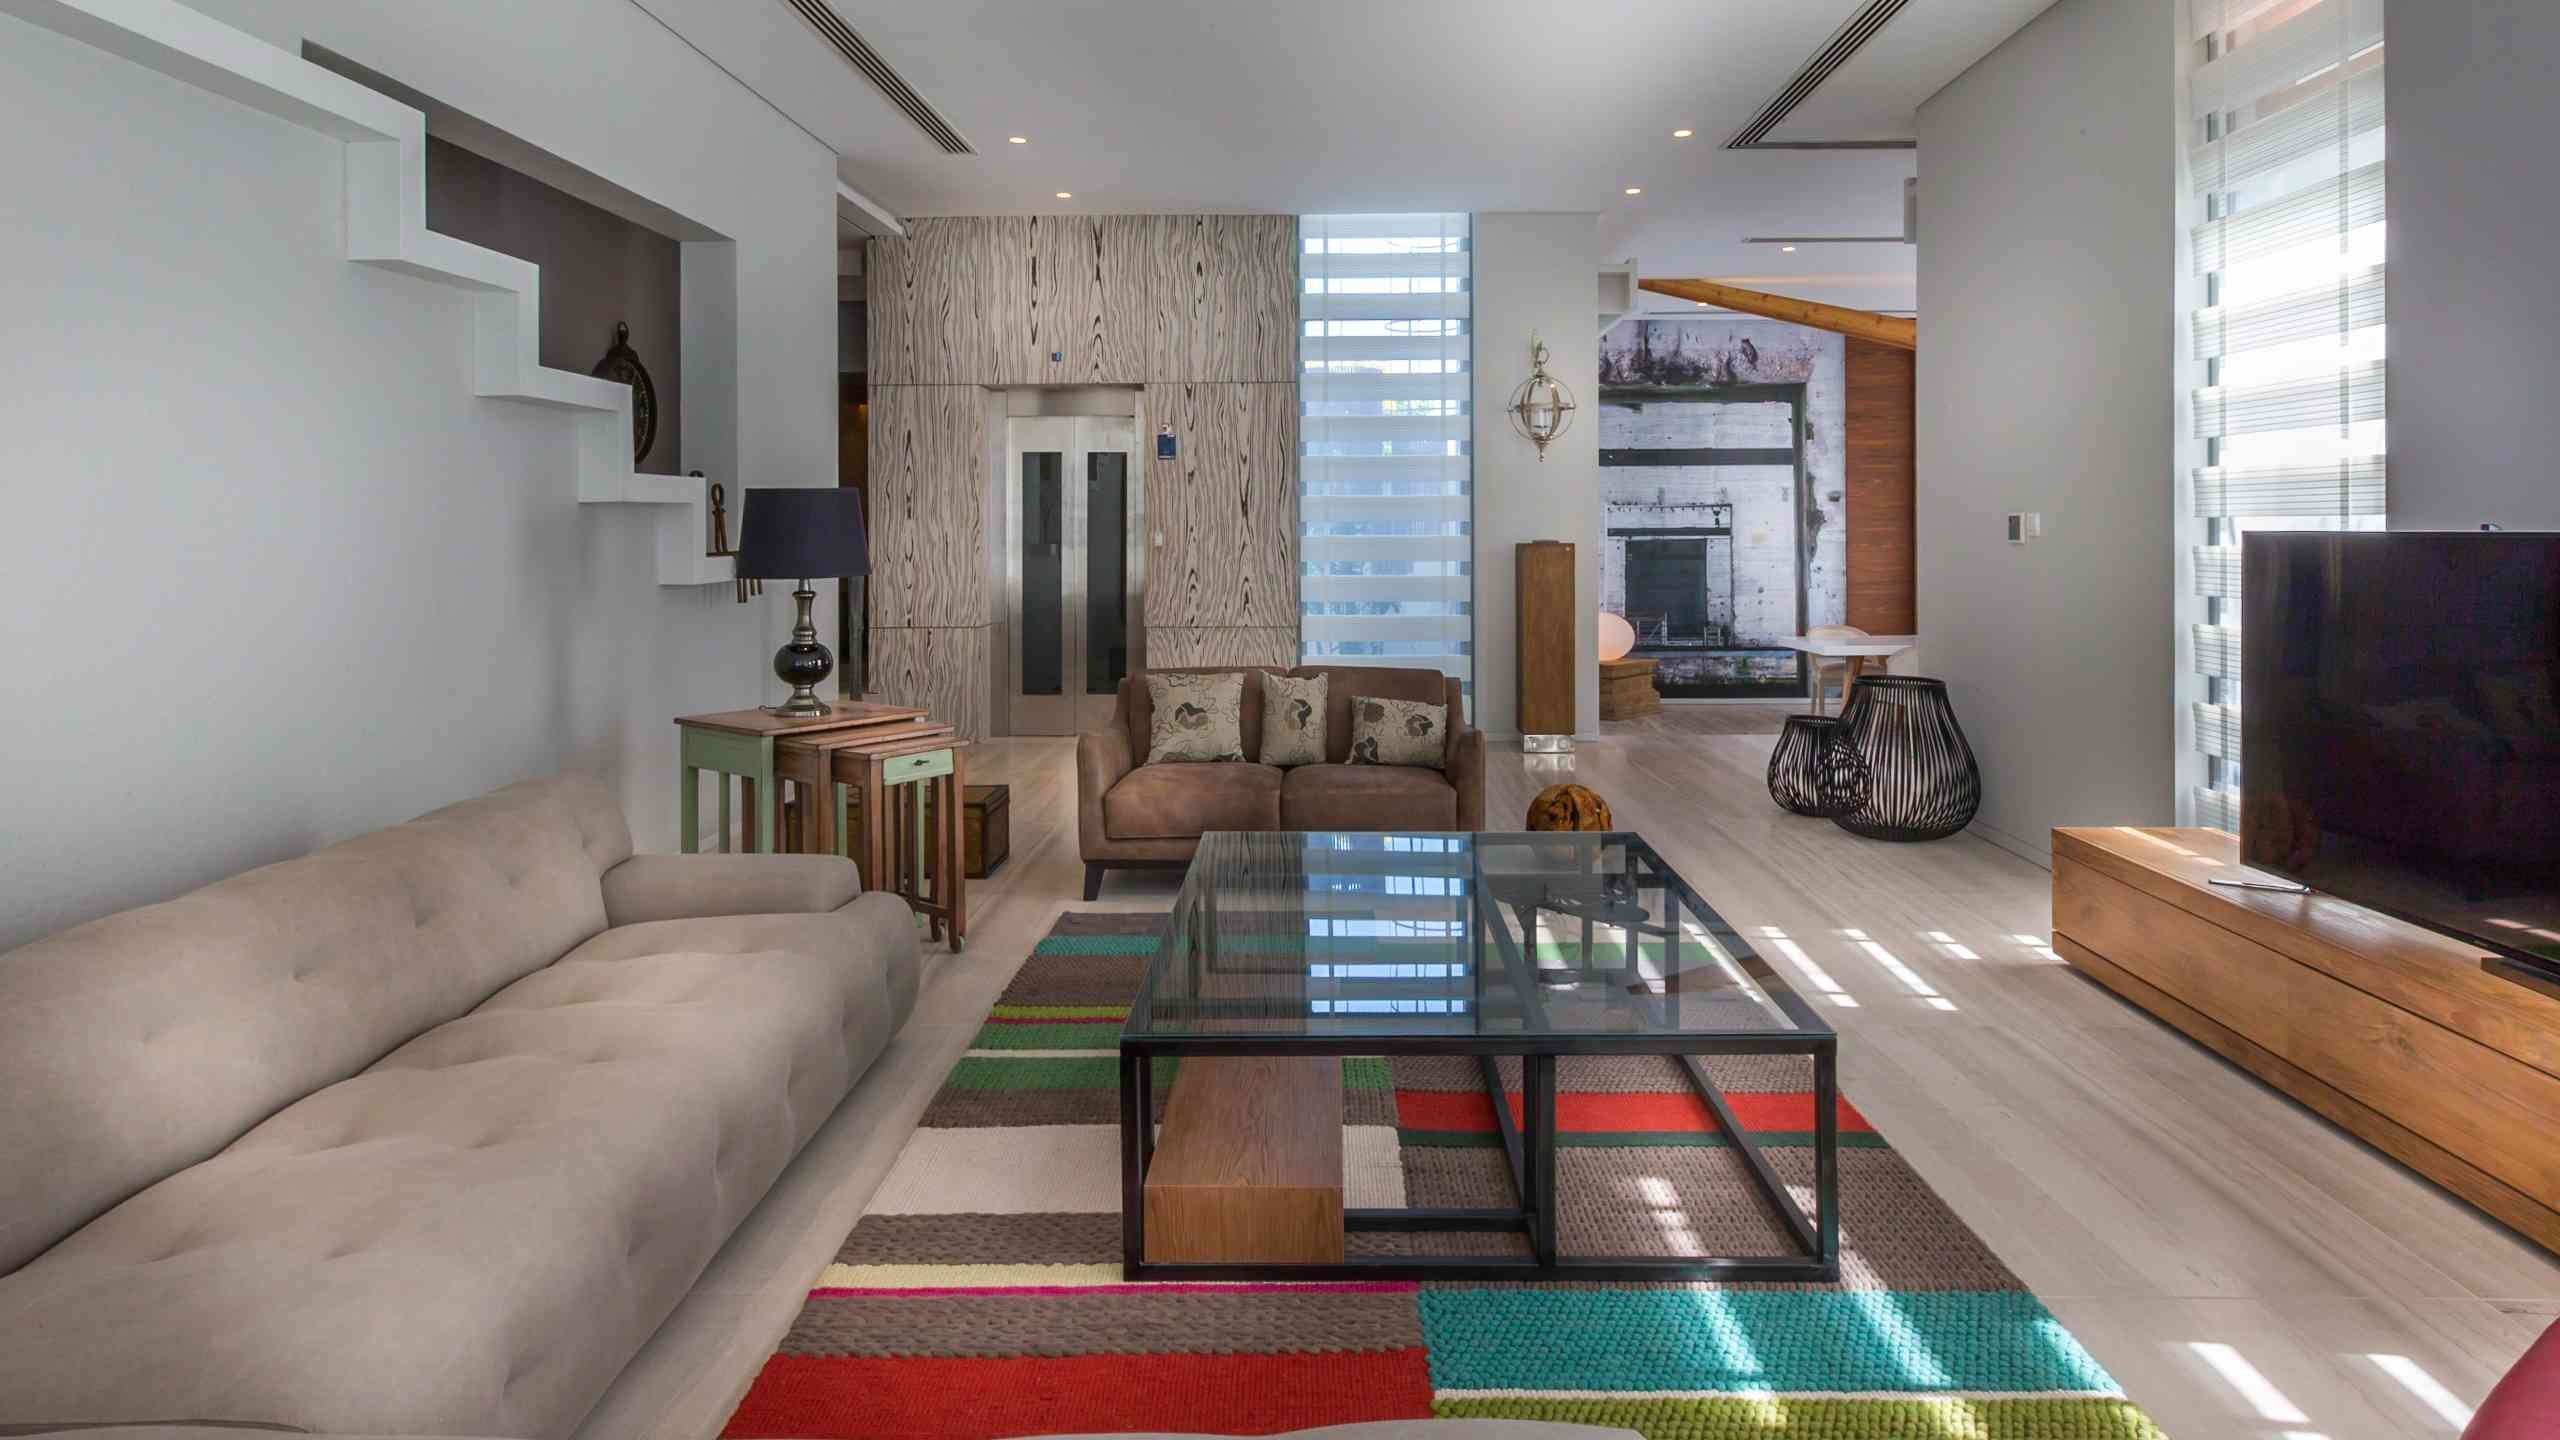 Tv Room Design By Moriq Interiors Tv Room Designs Tv